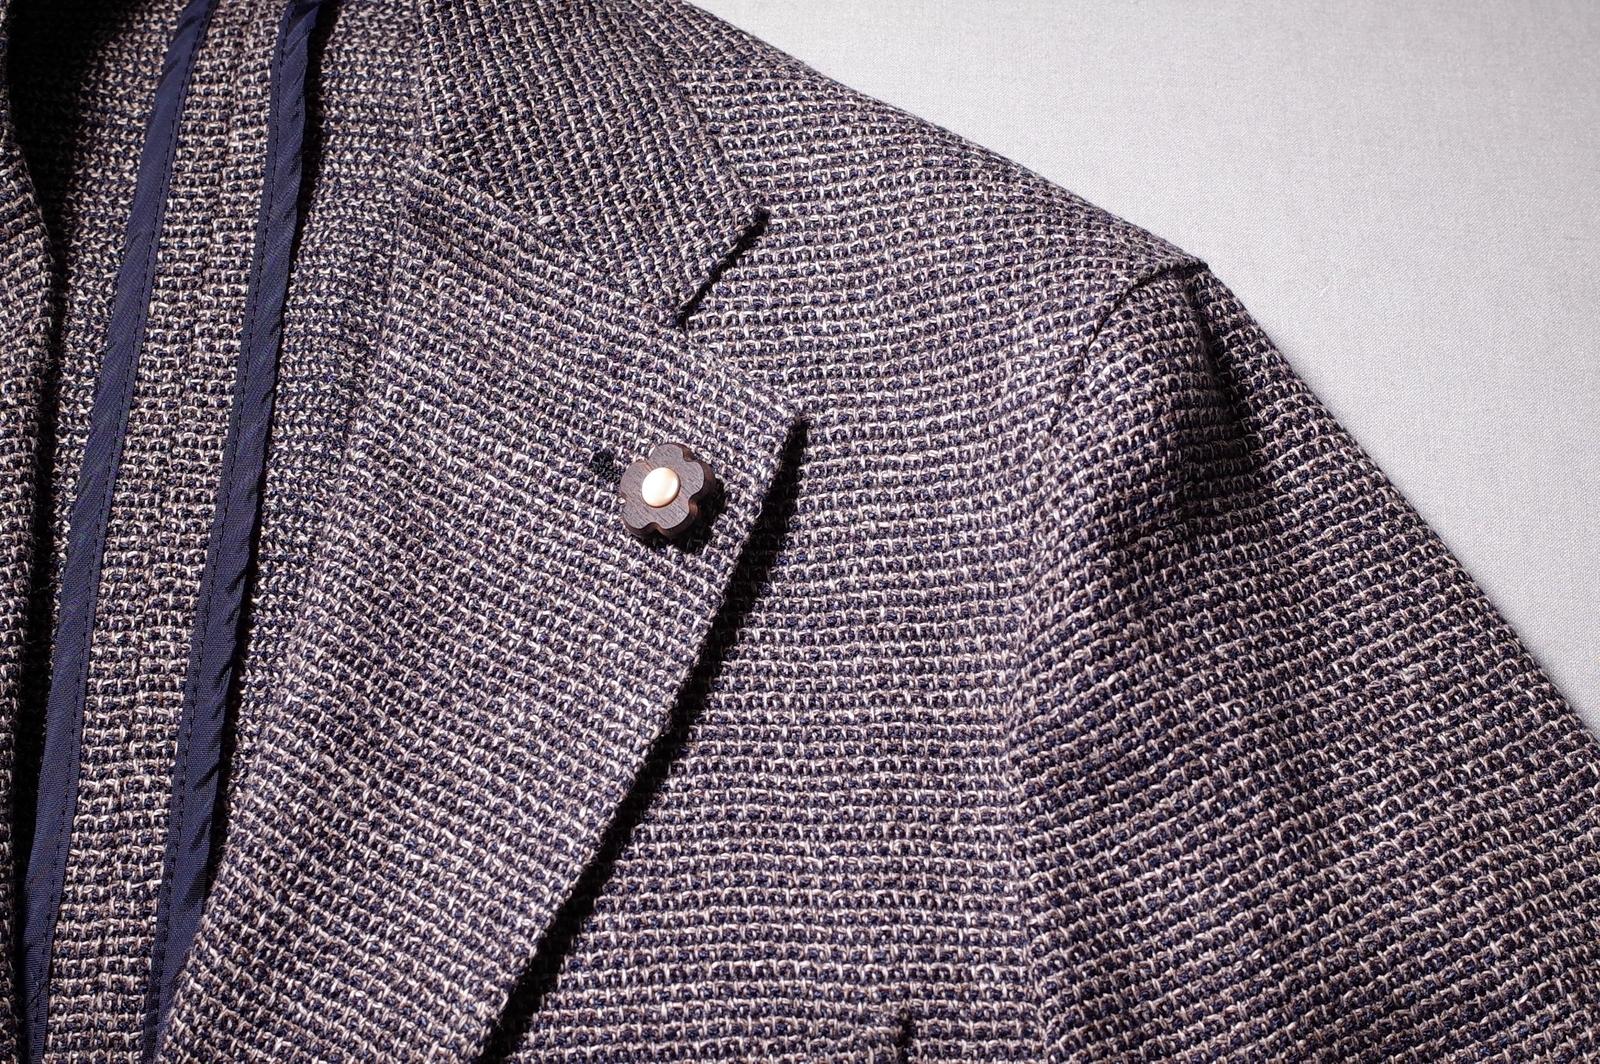 f:id:suits:20200719160545j:plain